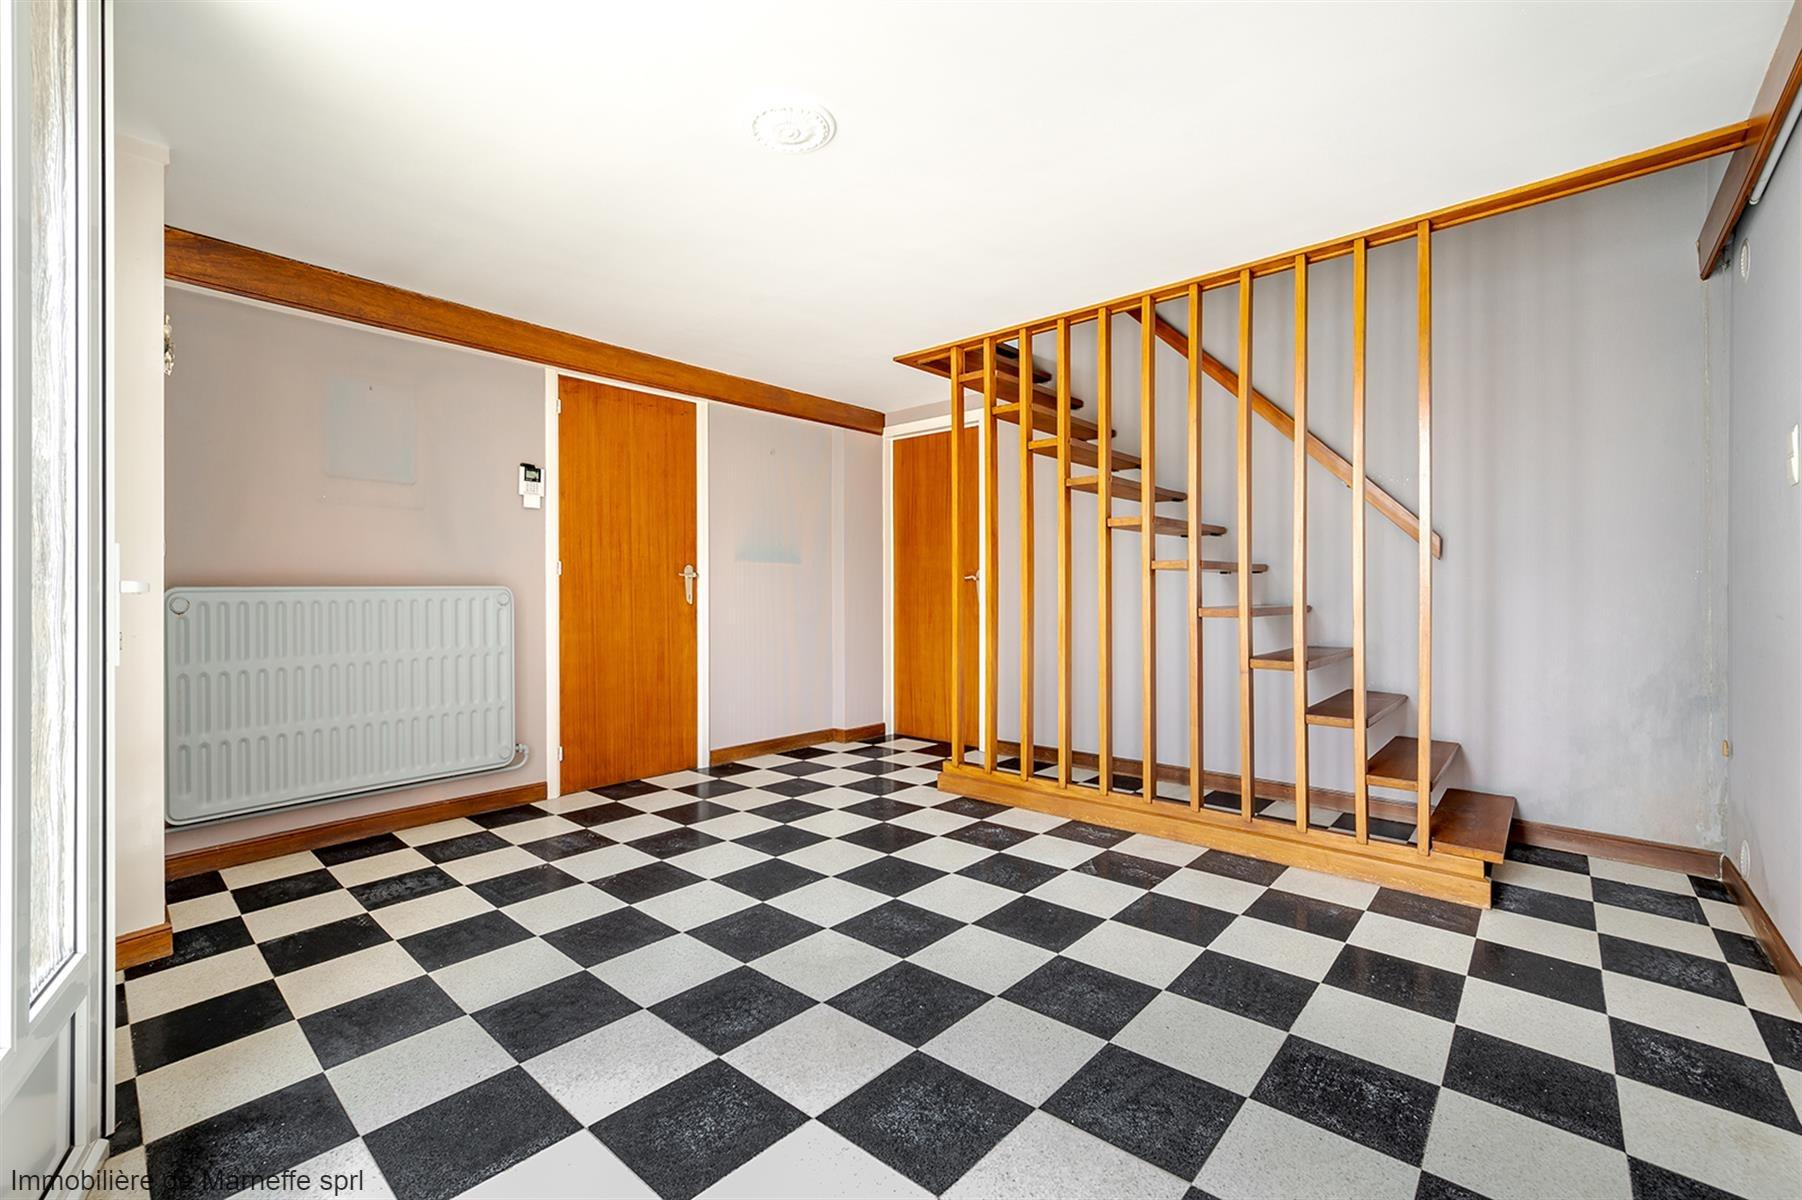 Maison - Berloz - #4343525-5